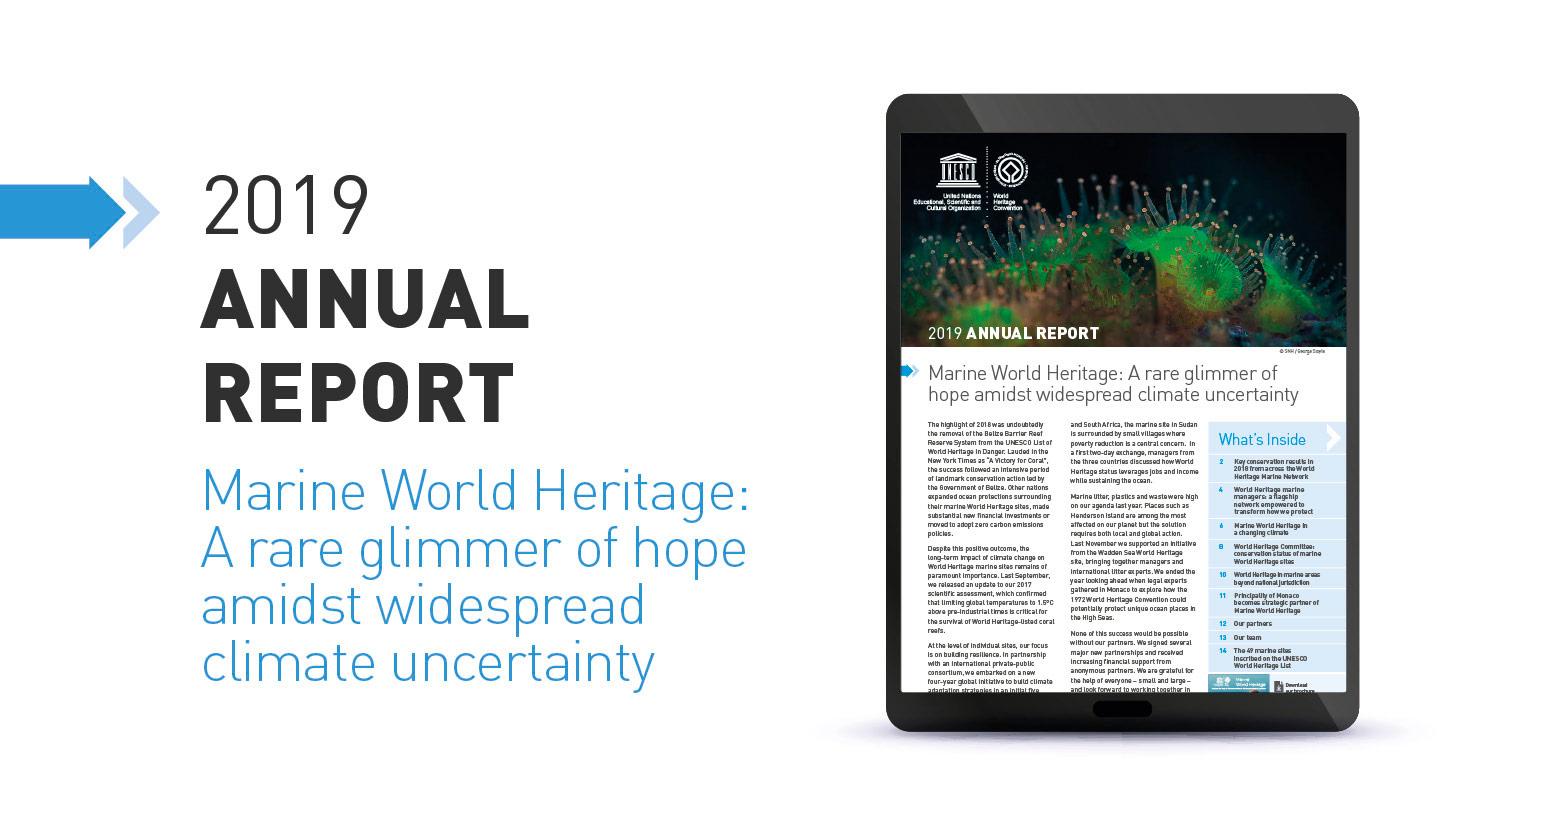 Marine World Heritage 2019 Annual Report - UNESCO World